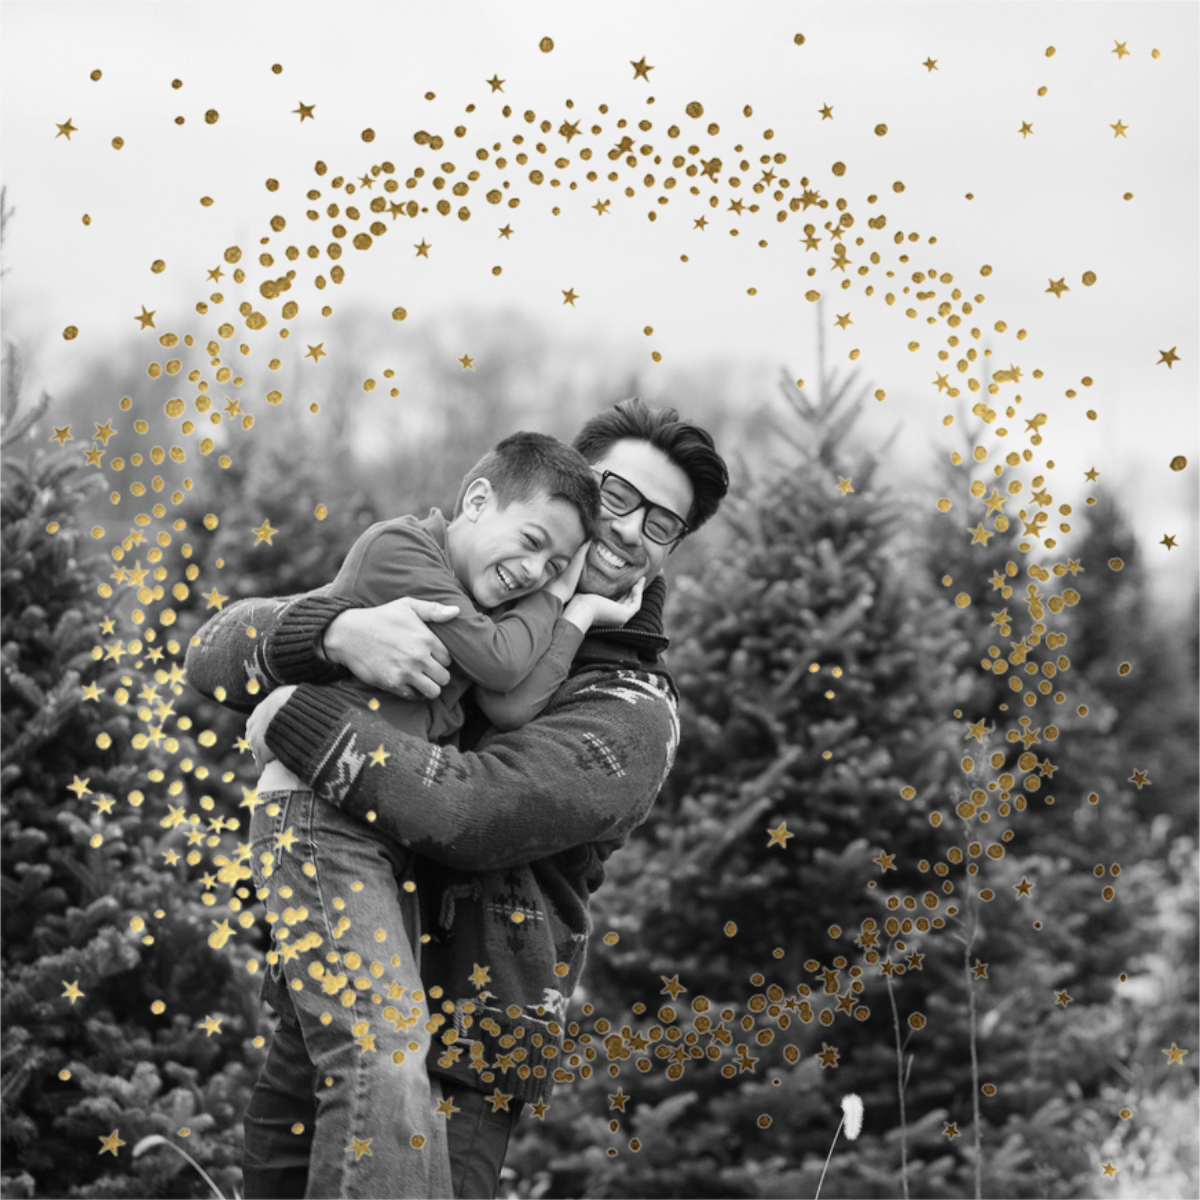 Wreath of Stars Photo - Paperless Post